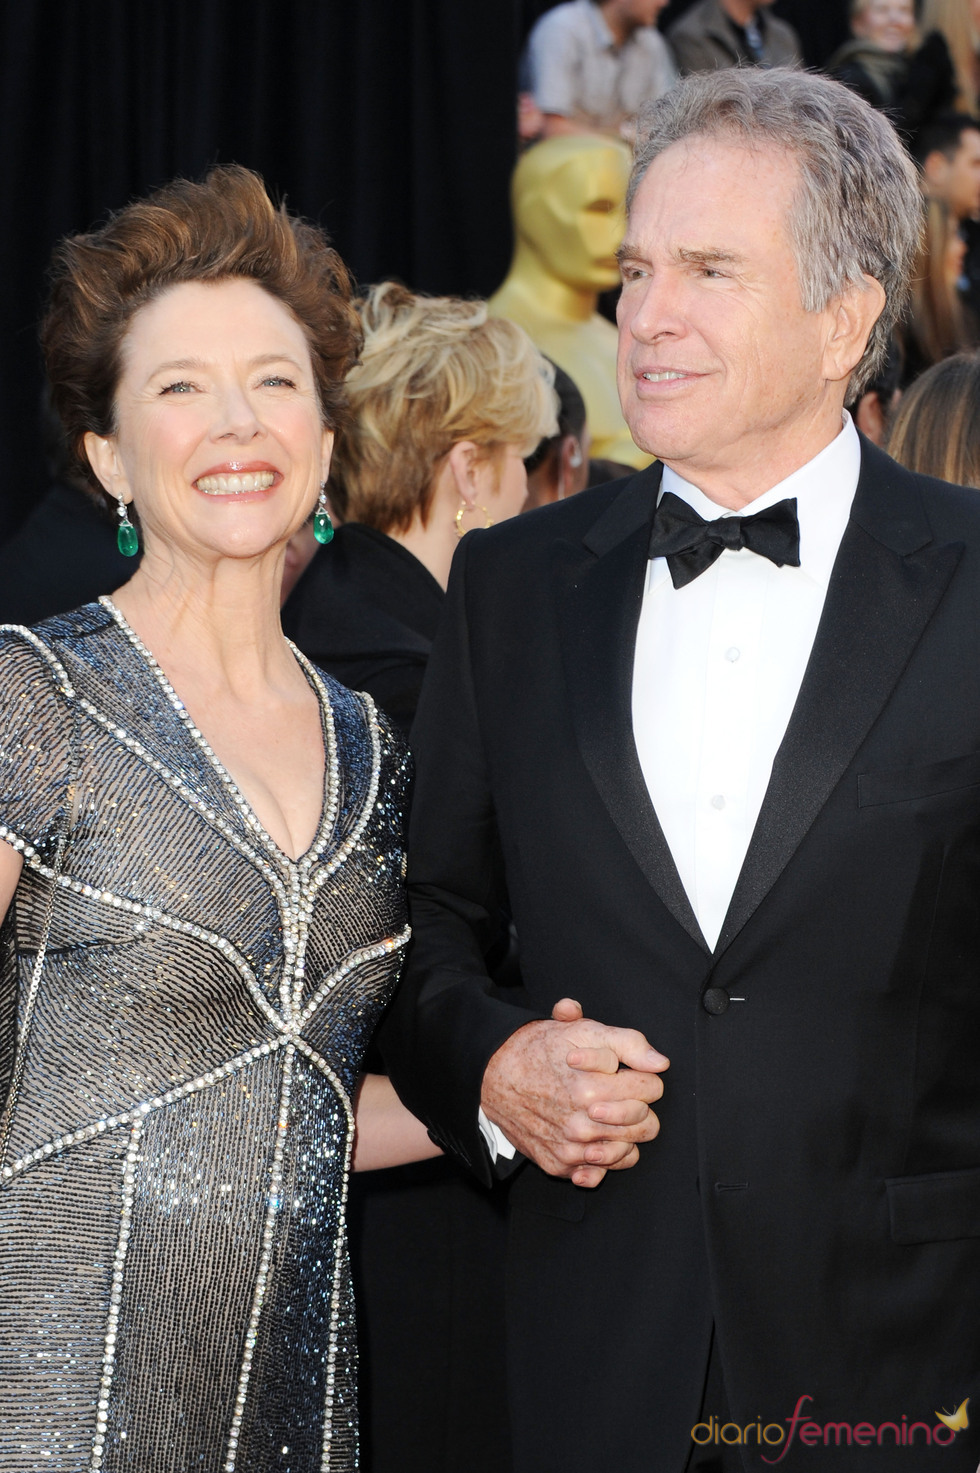 Annette Bening y Warren Beatty posan en la alfombra roja de los Oscar 2011